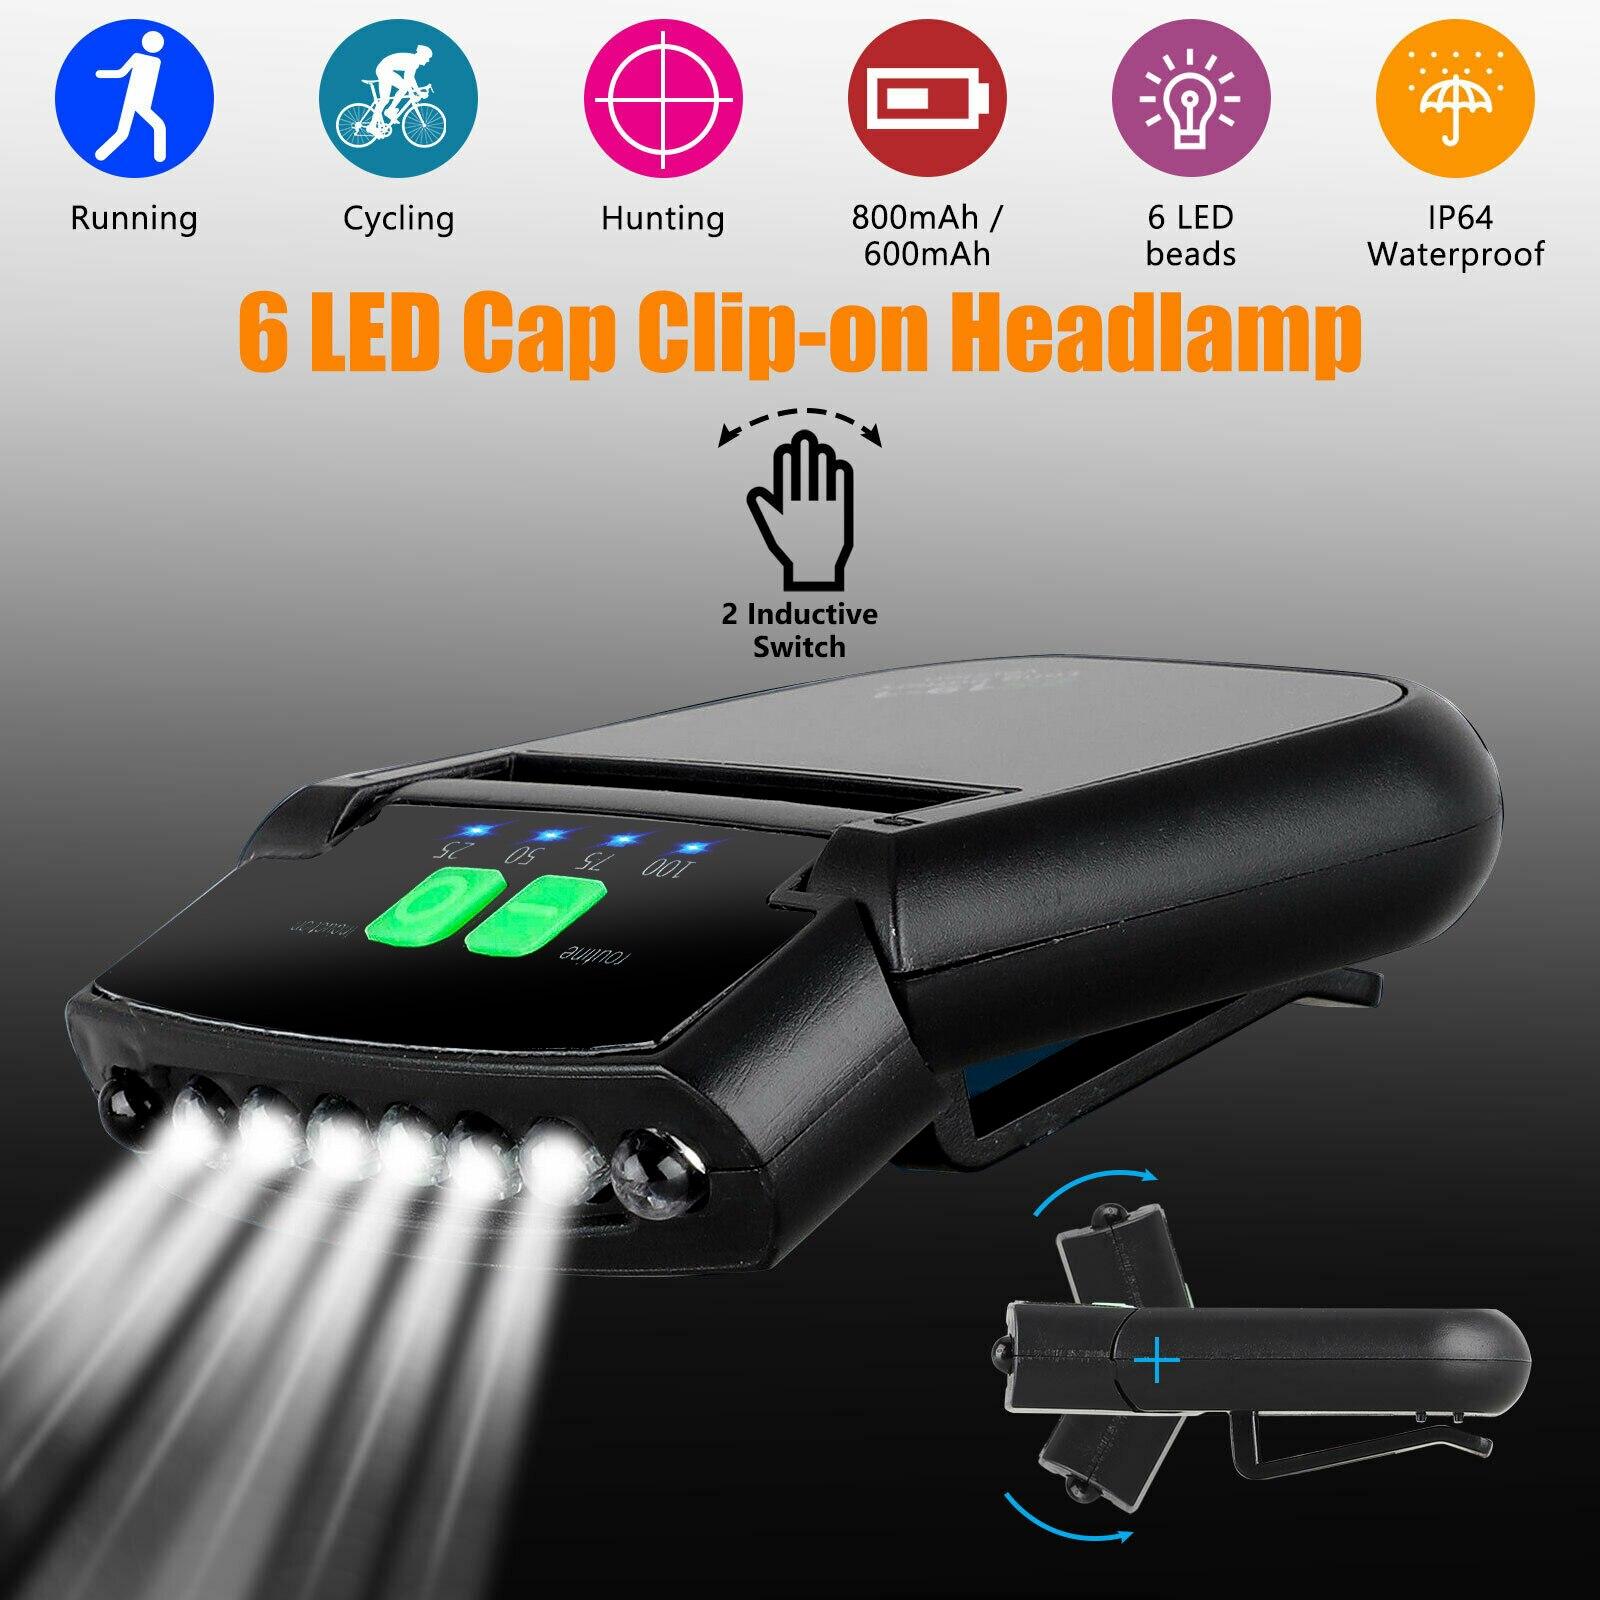 6 LED Clip-on Hat Sensory Headlight Light Cap Hat Lamp Headlamp USB Rechargeable Head Lamp Lights Outdoor